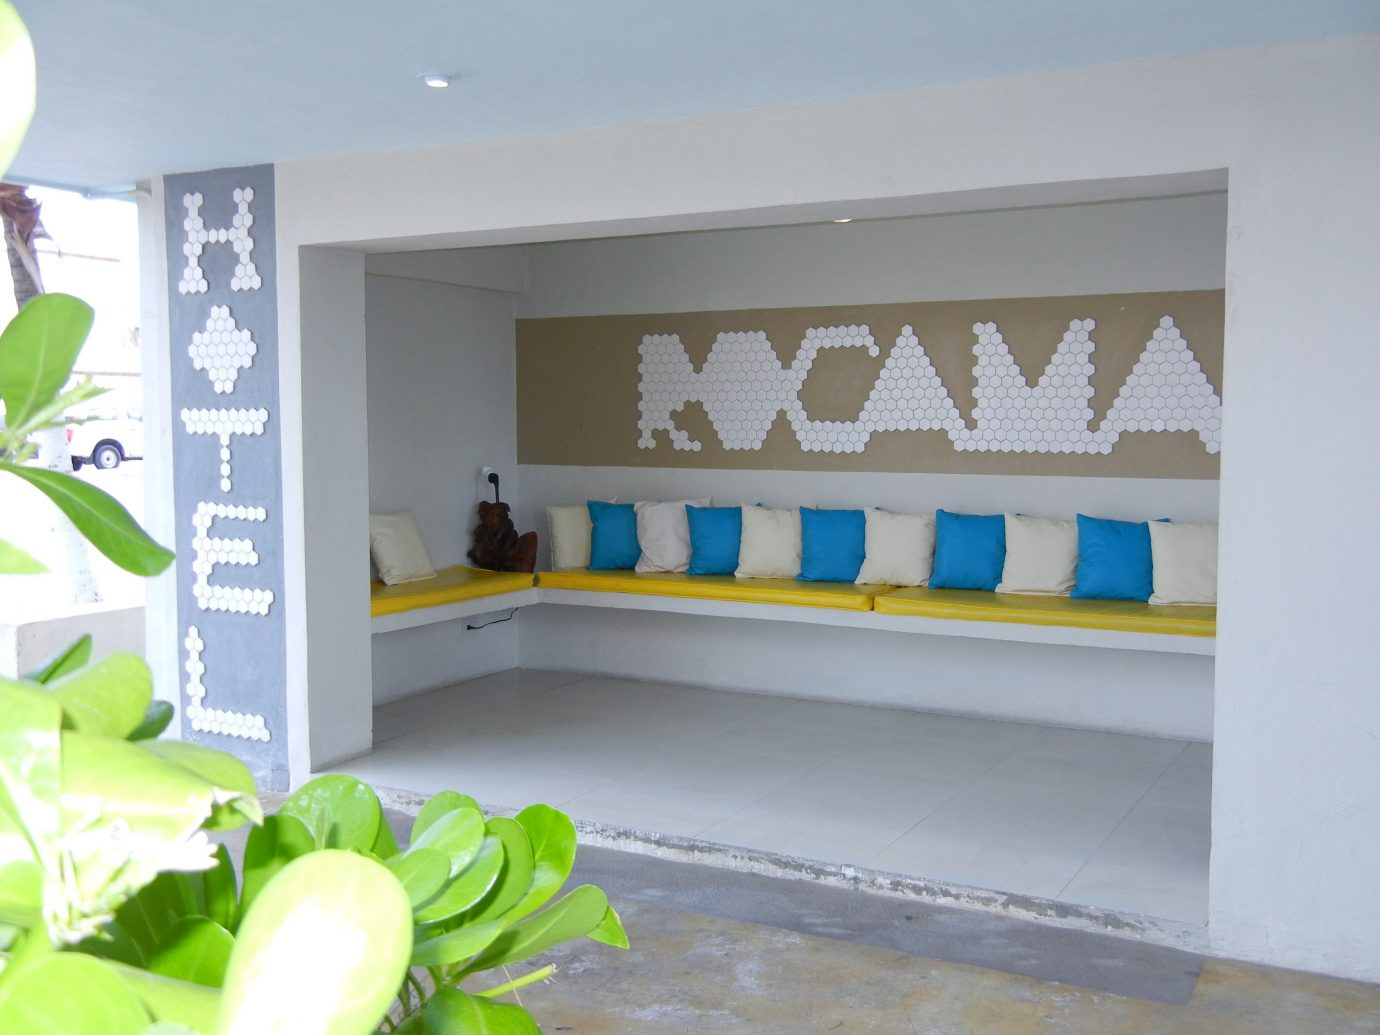 Budget indoor property room wall interior design furniture home plant real estate mural bed vegetable